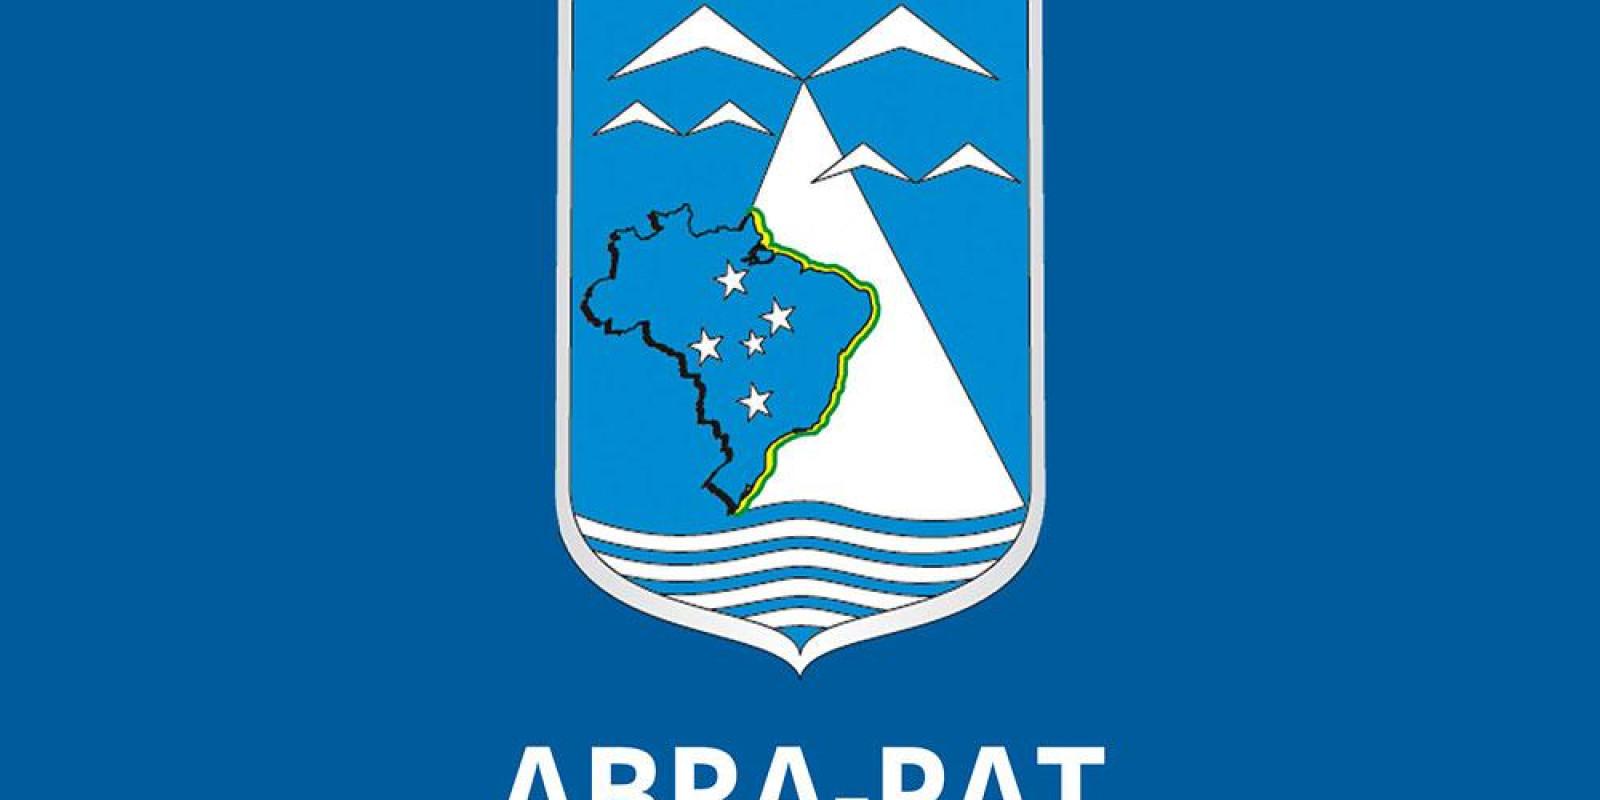 Manifesto aos integrantes da ABRA-PAT